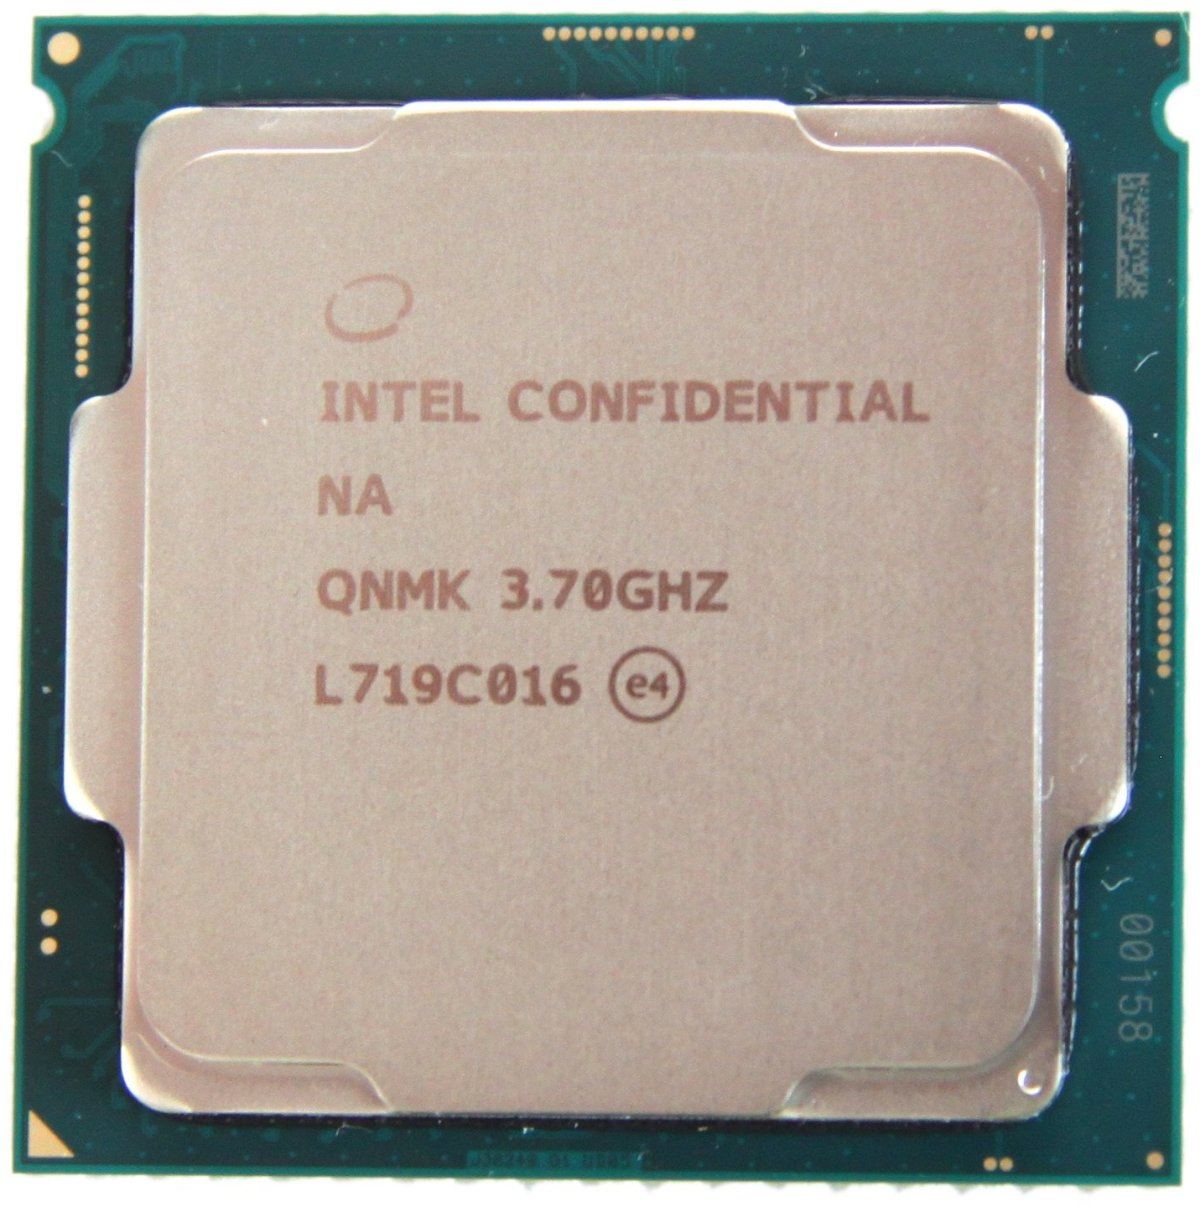 Intel Management Engine - Minix